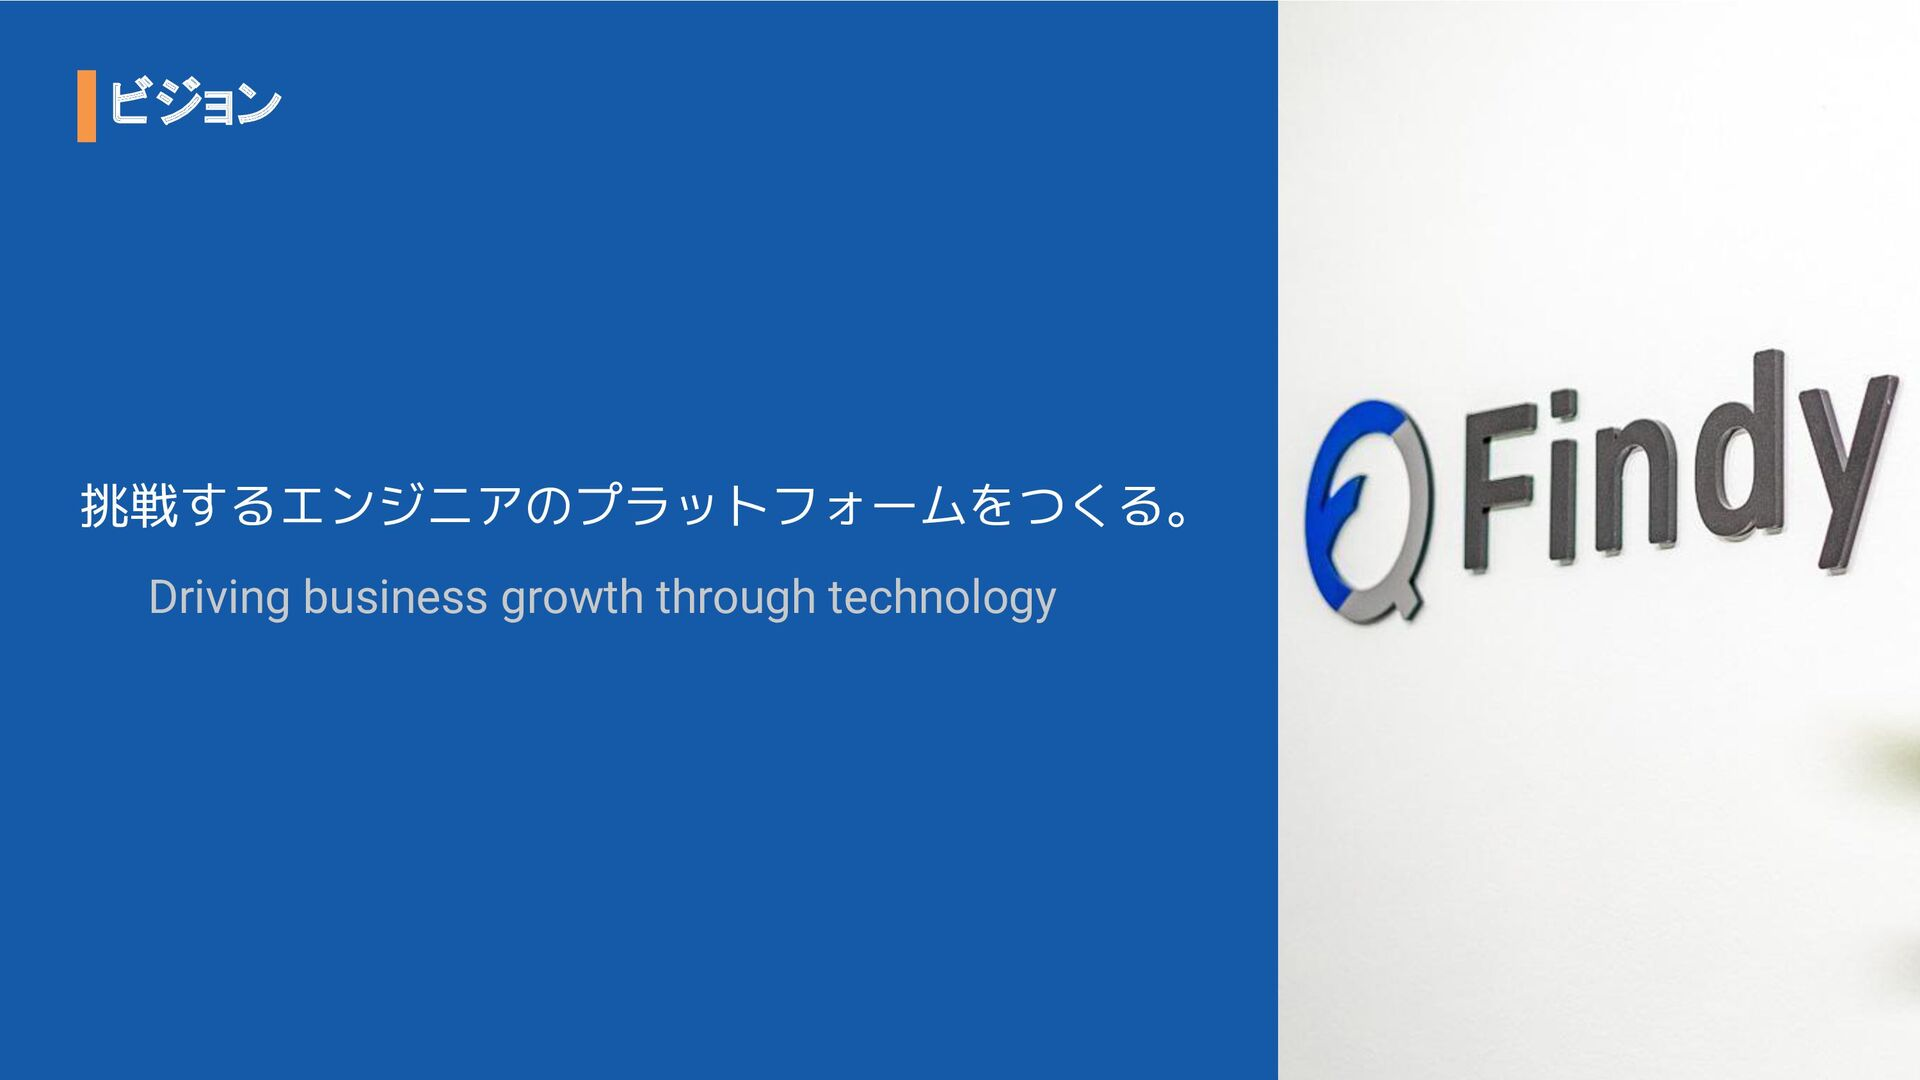 ©2021 Findy Inc. VISION背景 - 世界に遅れを取る日本 - Global...